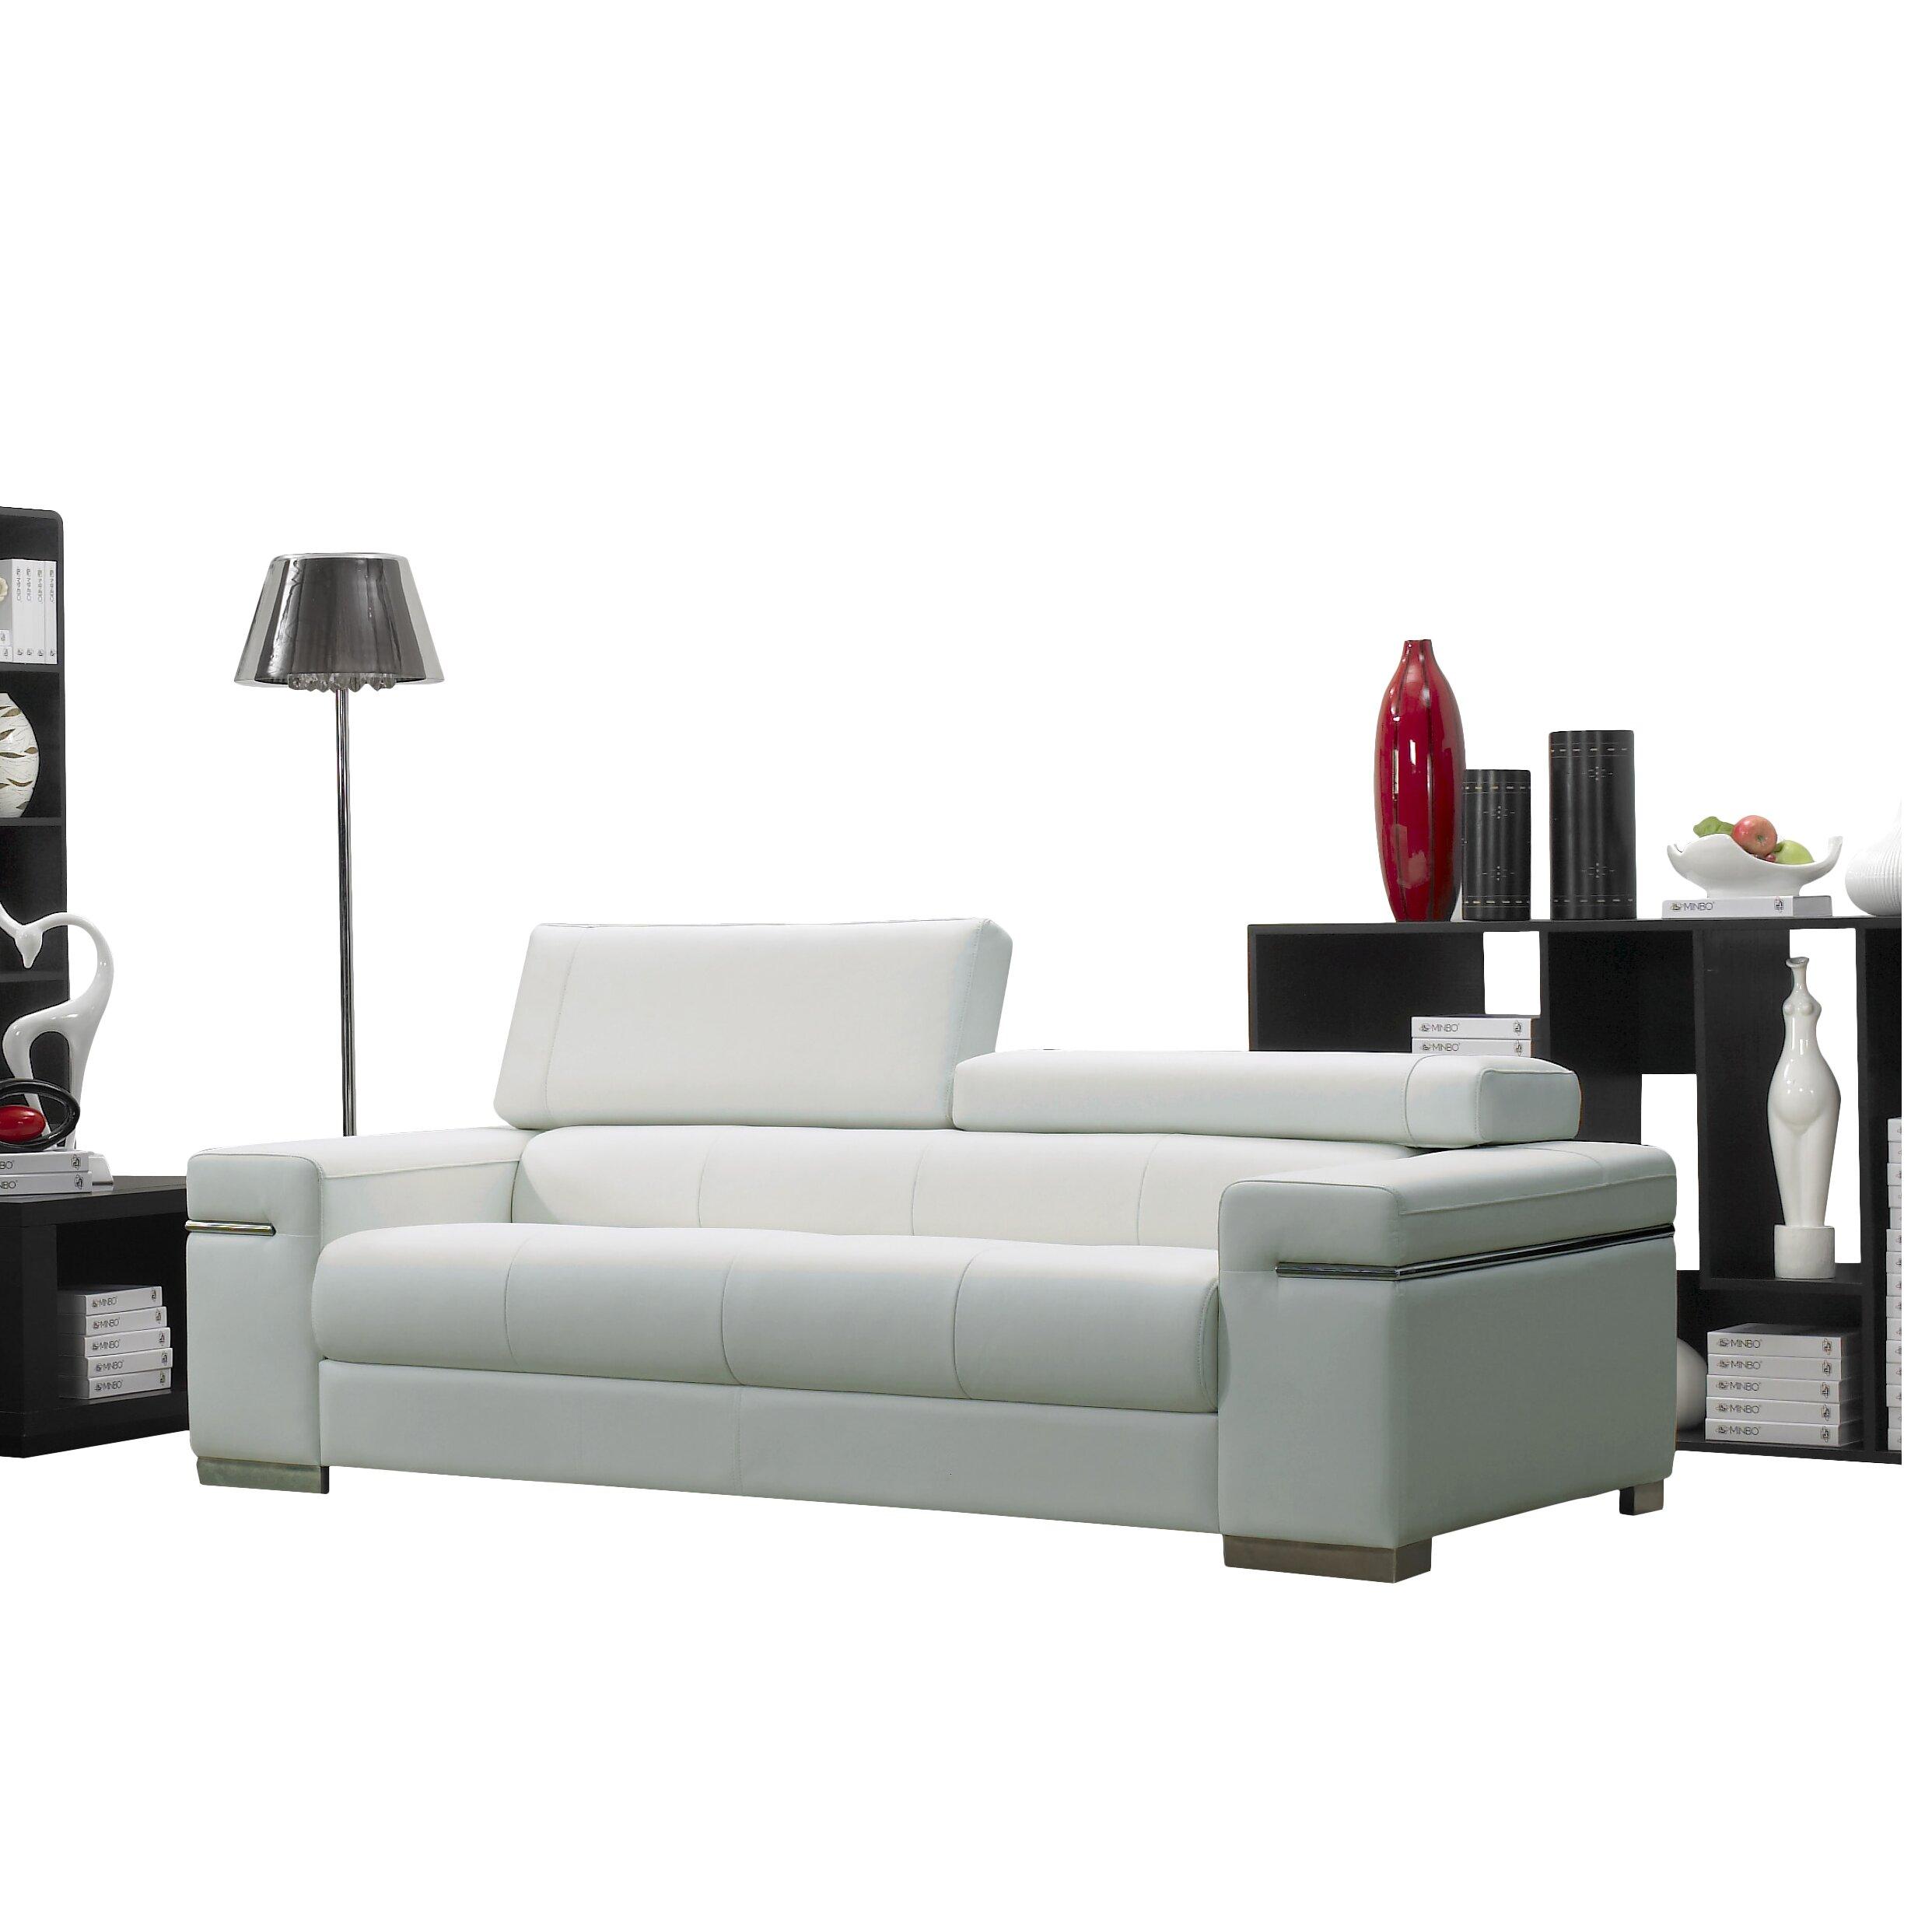 Wade logan orlando leather sofa allmodern for Leather sectional sofa orlando